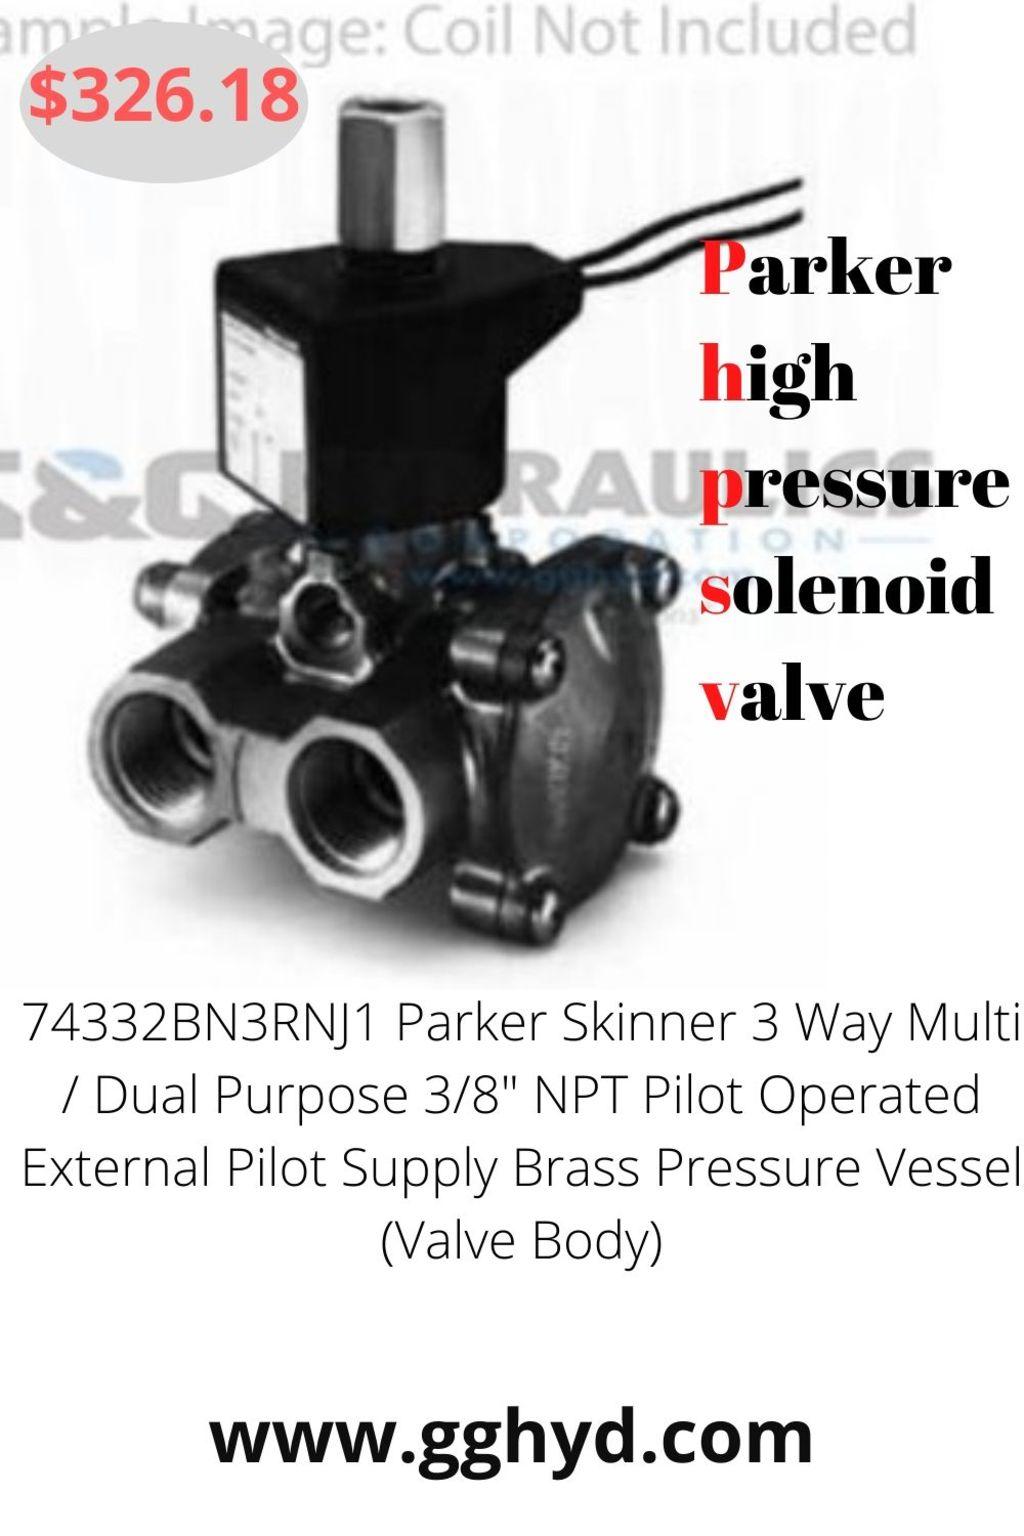 Parker High Pressure Solenoid Valve via G&G Hydraulics Corporations